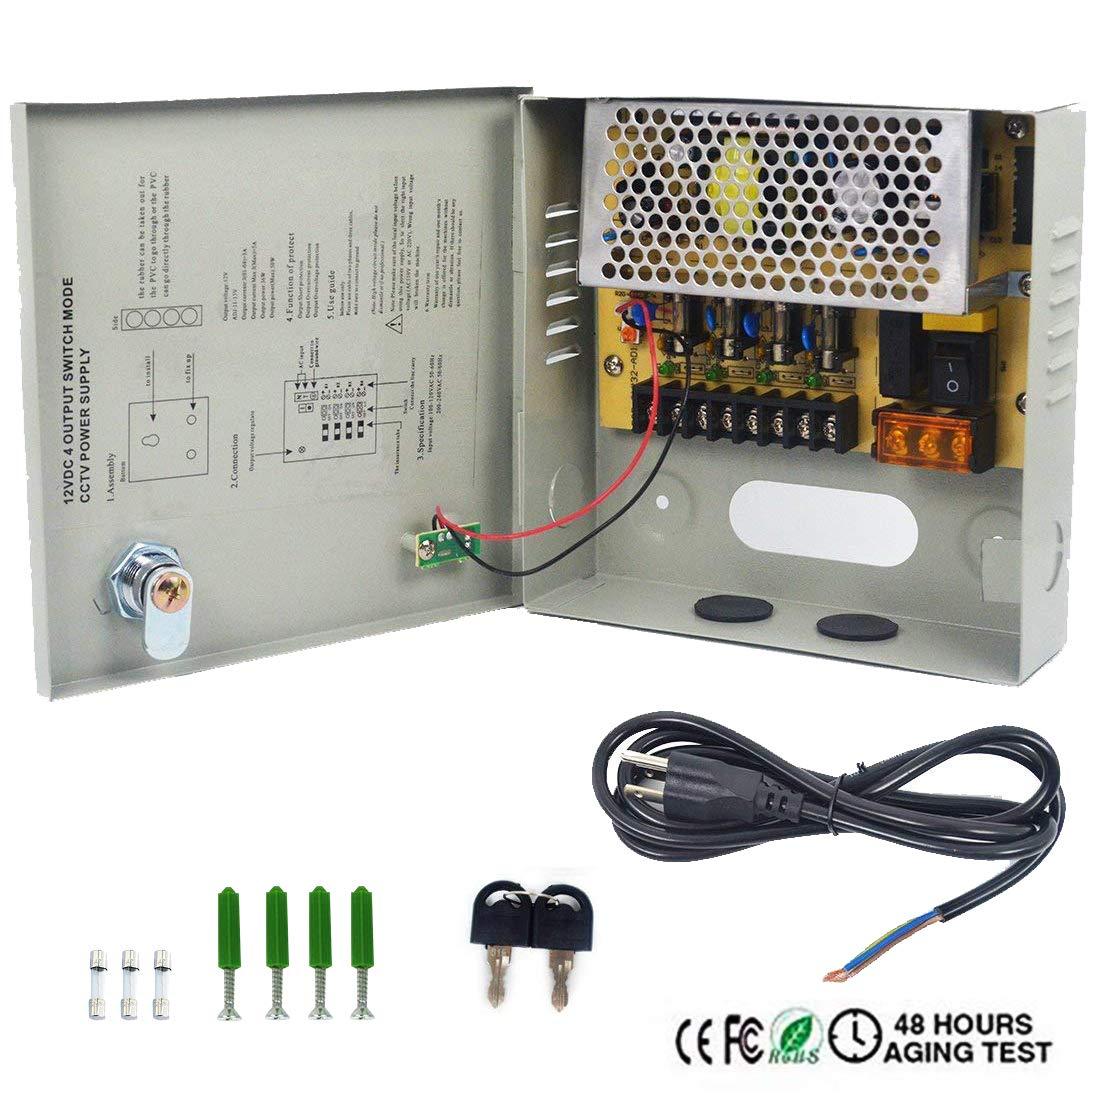 Amazon.com: LETOUR DC Power Supply 4 Channel Port Output 12V 45W ...